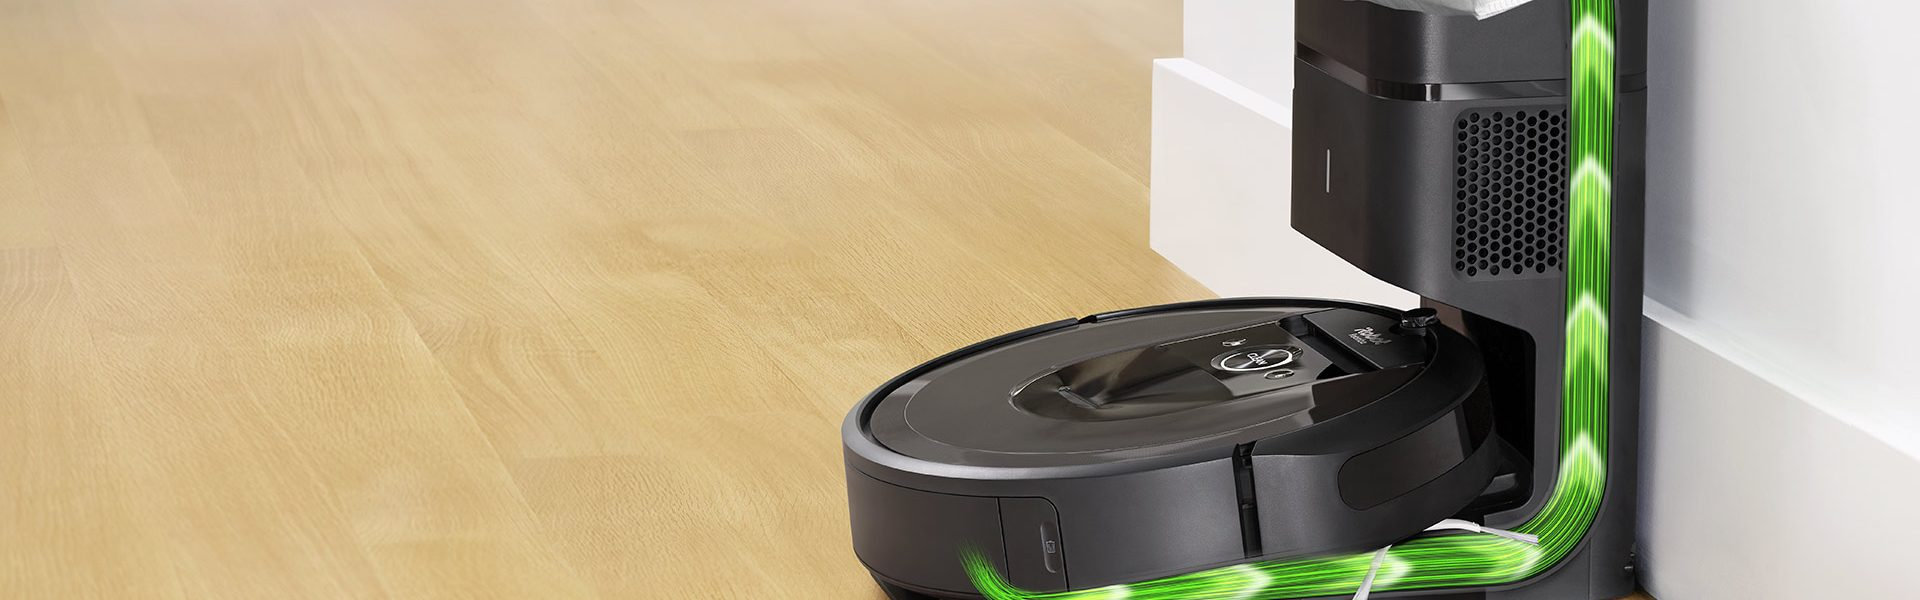 НОВЫЙ iRobot Roomba i7+